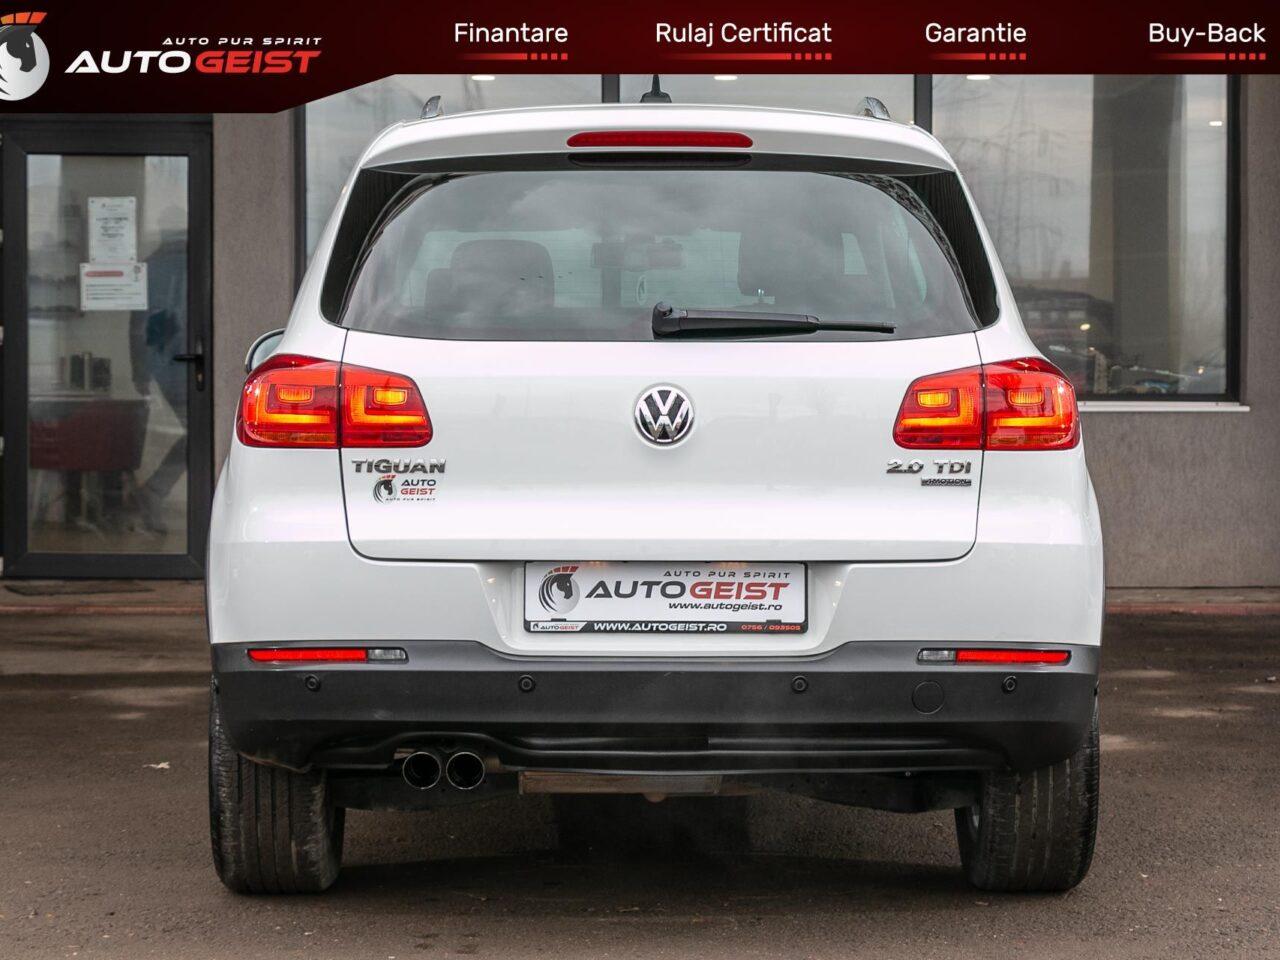 VW-TIGUAN-2015-manual-3466